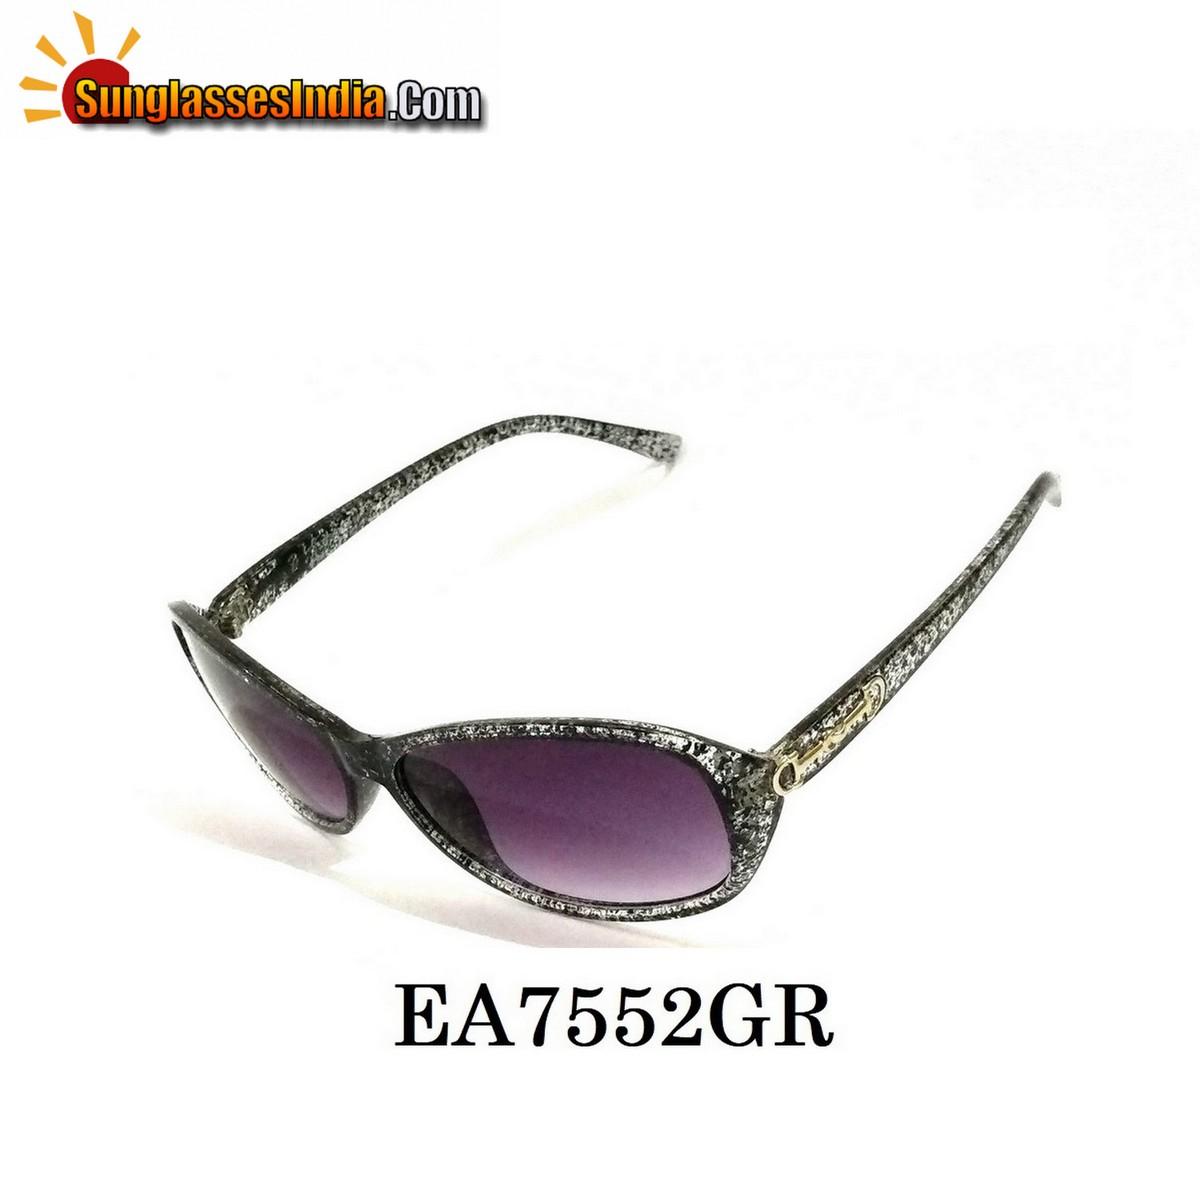 Grey Women Sunglasses EA7552GR